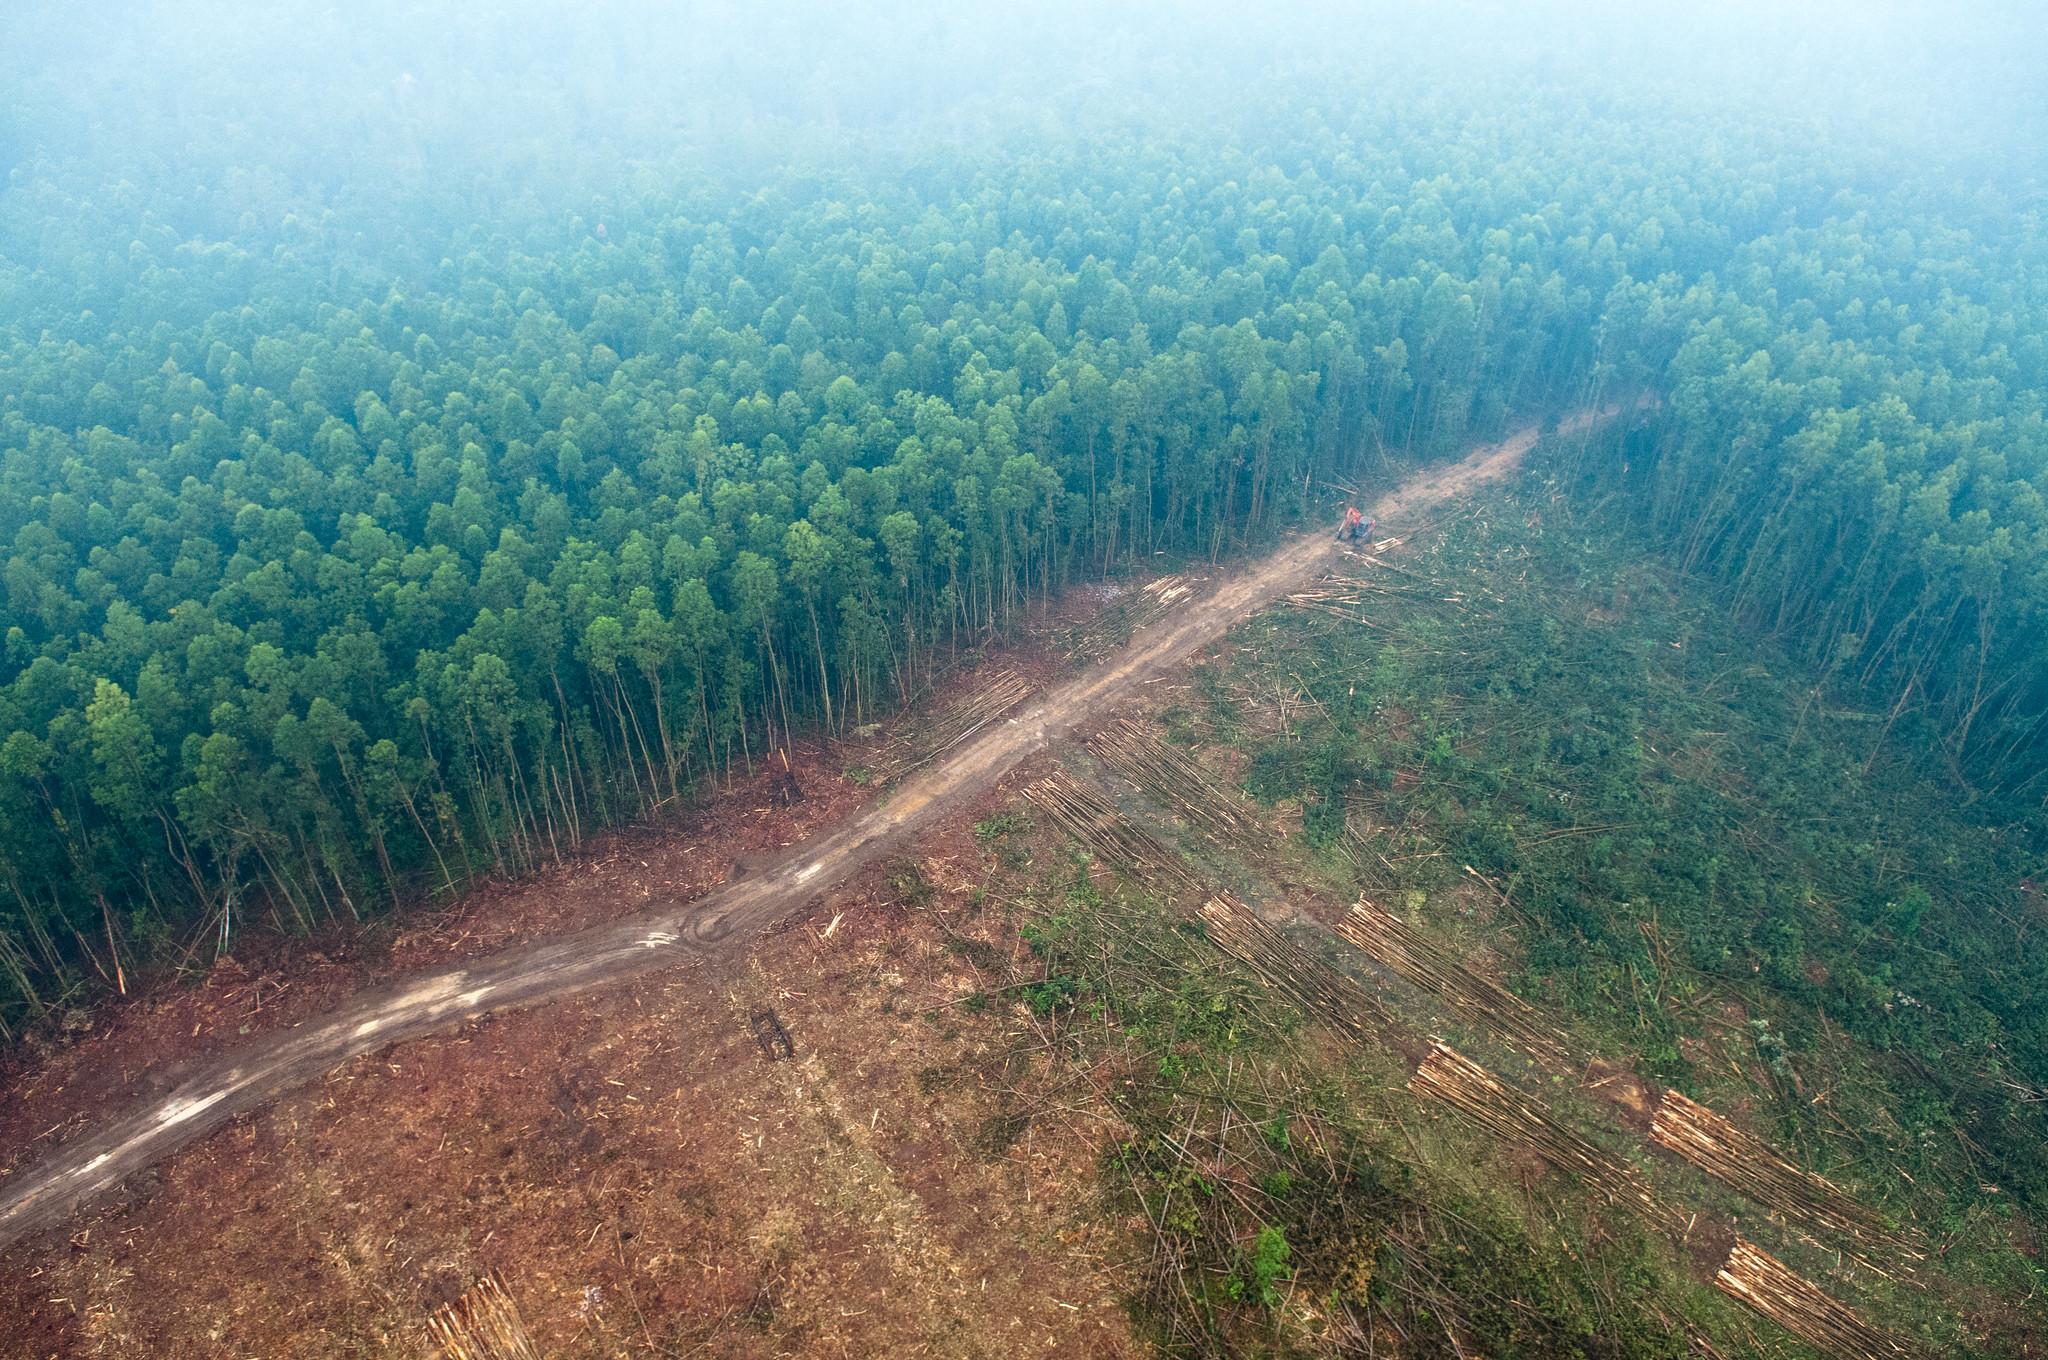 Global forest restoration hotspots identified